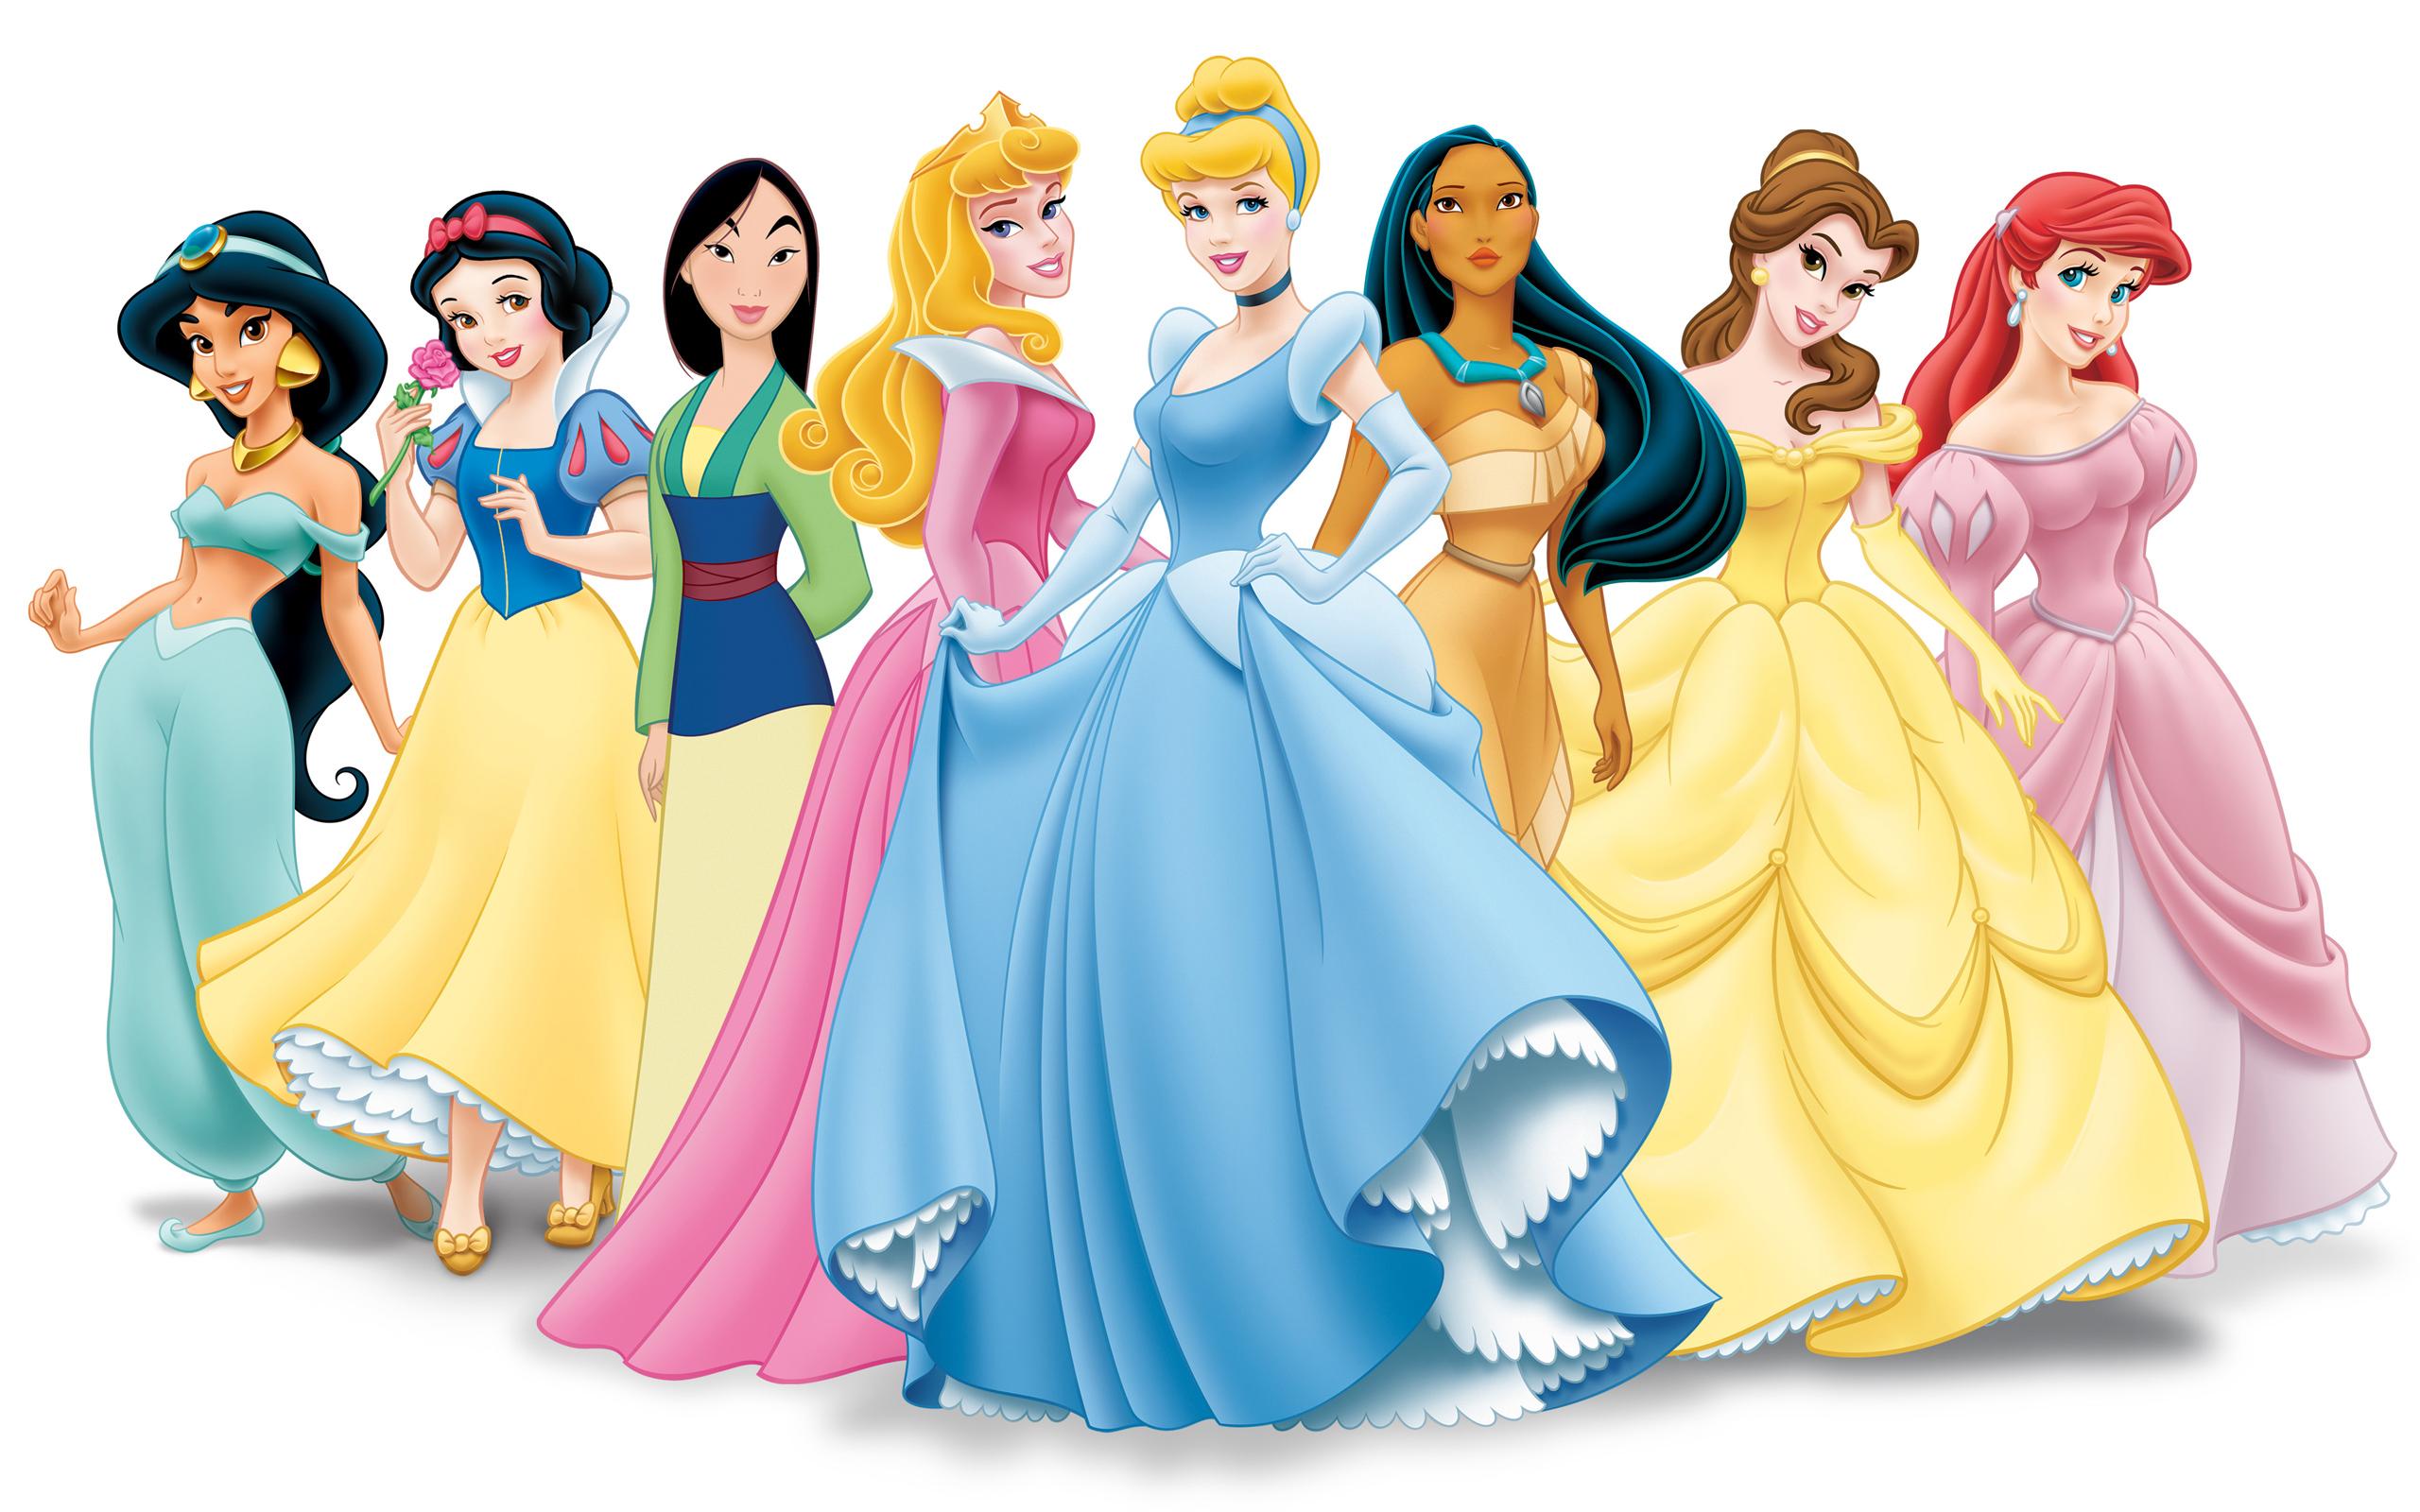 Disney princess wallpaper hd wallpapersafari - Cute disney hd wallpapers ...